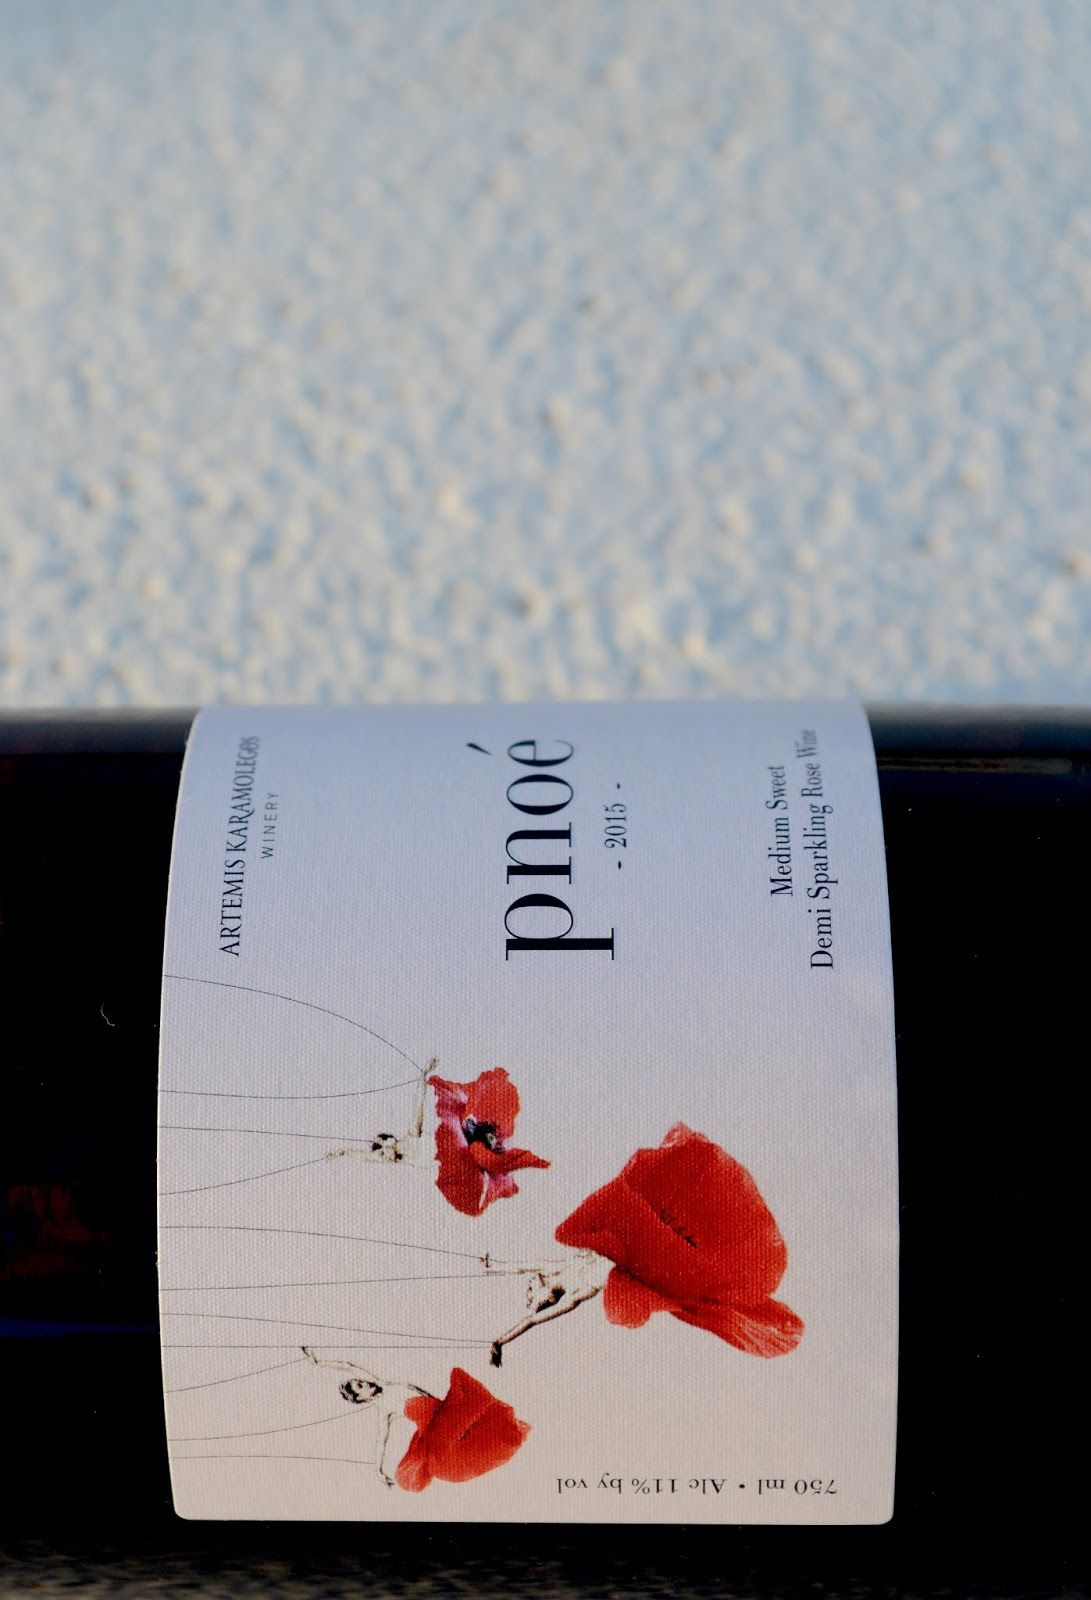 pnoé - Artemis Karamolegos Winery Santorini (vin) | Design : stefi filippopoulou, Santorin, Grèce (juillet 2016)